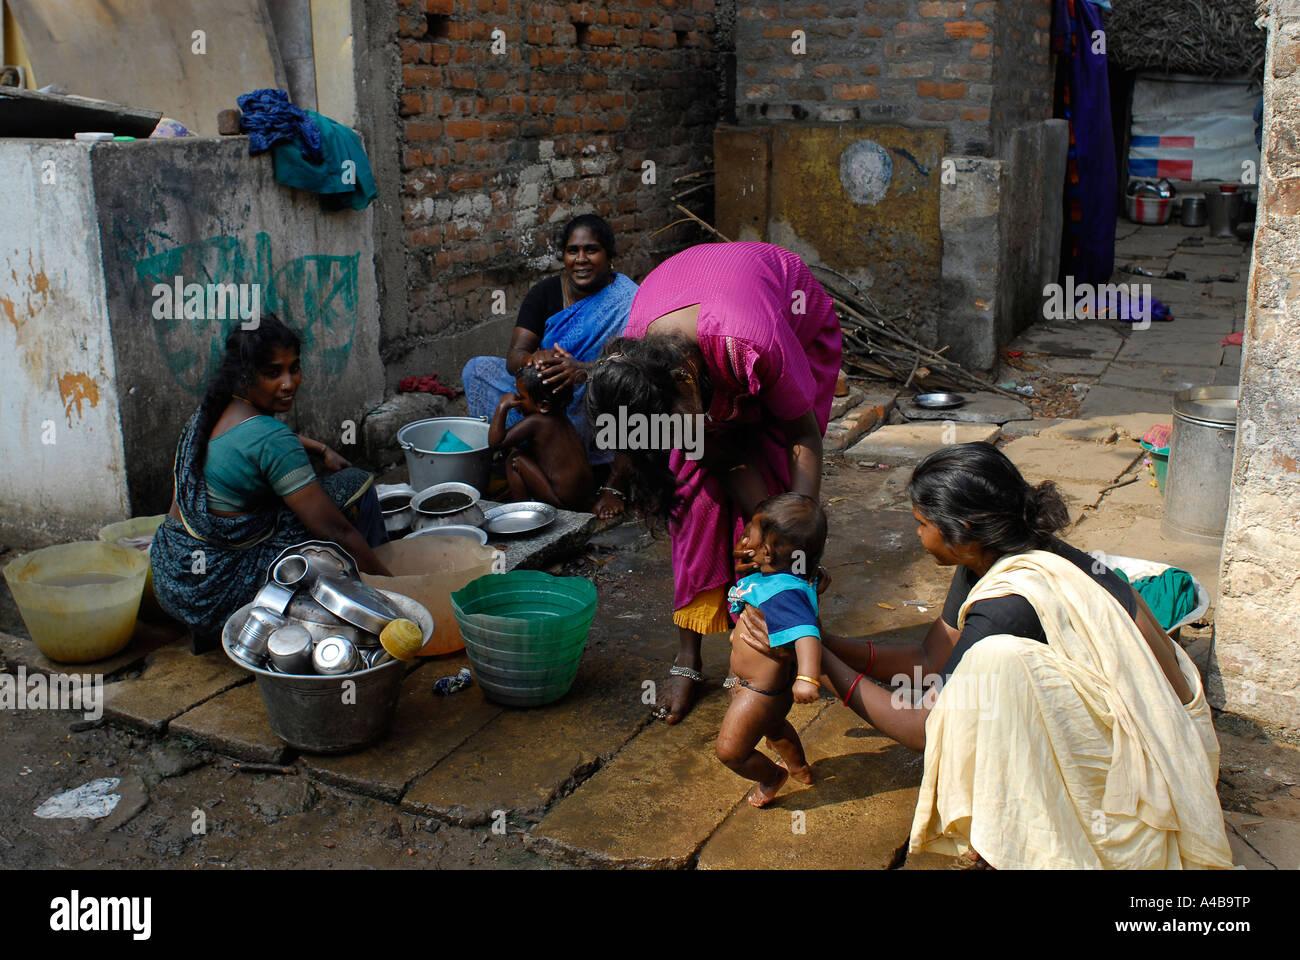 Stock Image of Dalit mother bathing baby boy at community well in the Jagathapuram slum in Chennai Tamil Nadu India - Stock Image